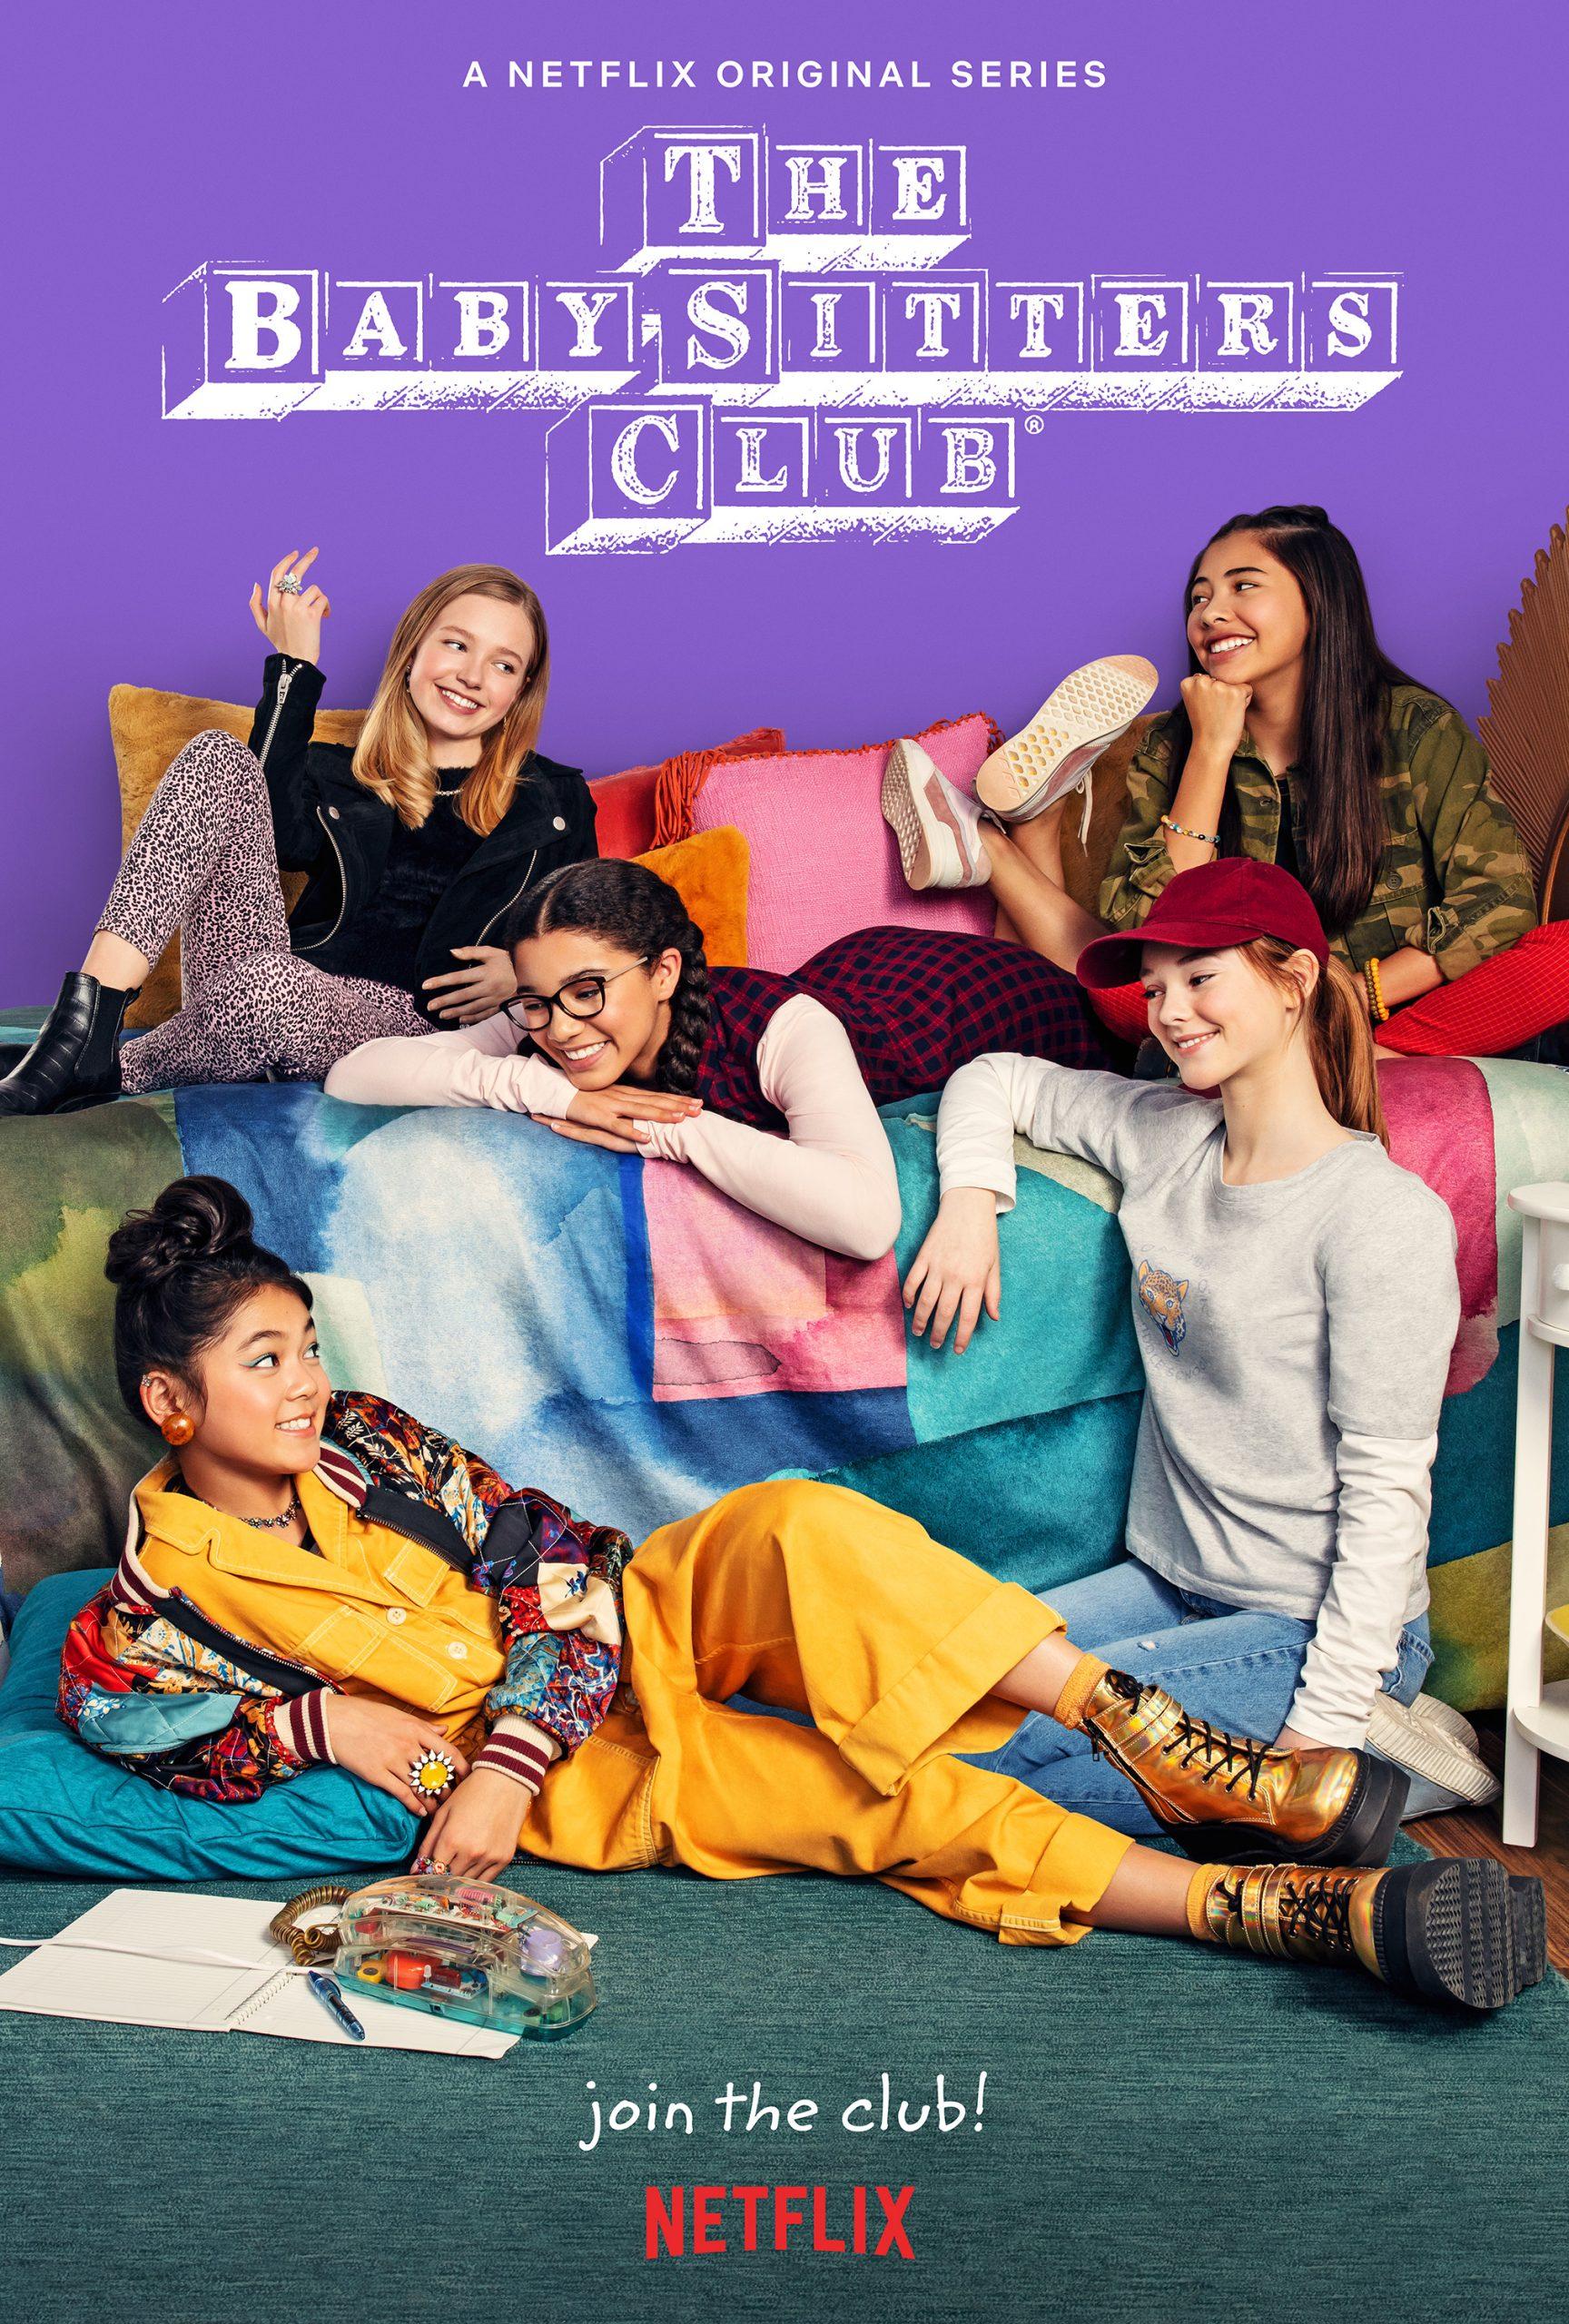 New Movie: Netflix's The Babysitters Club